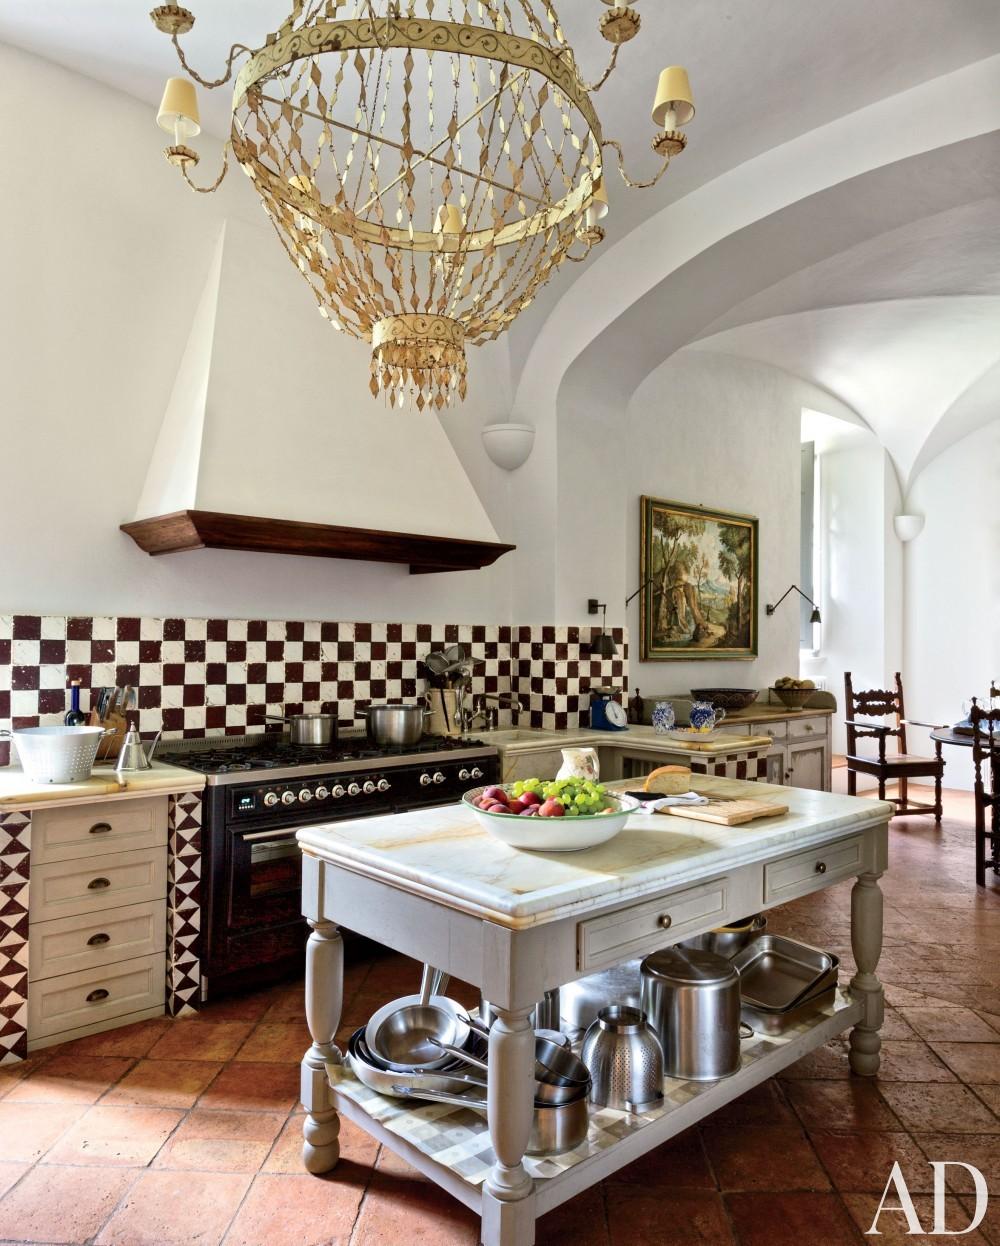 Traditional Kitchen by Camilla Guinness and Bolko von Schweinichen in Tuscany, Italy